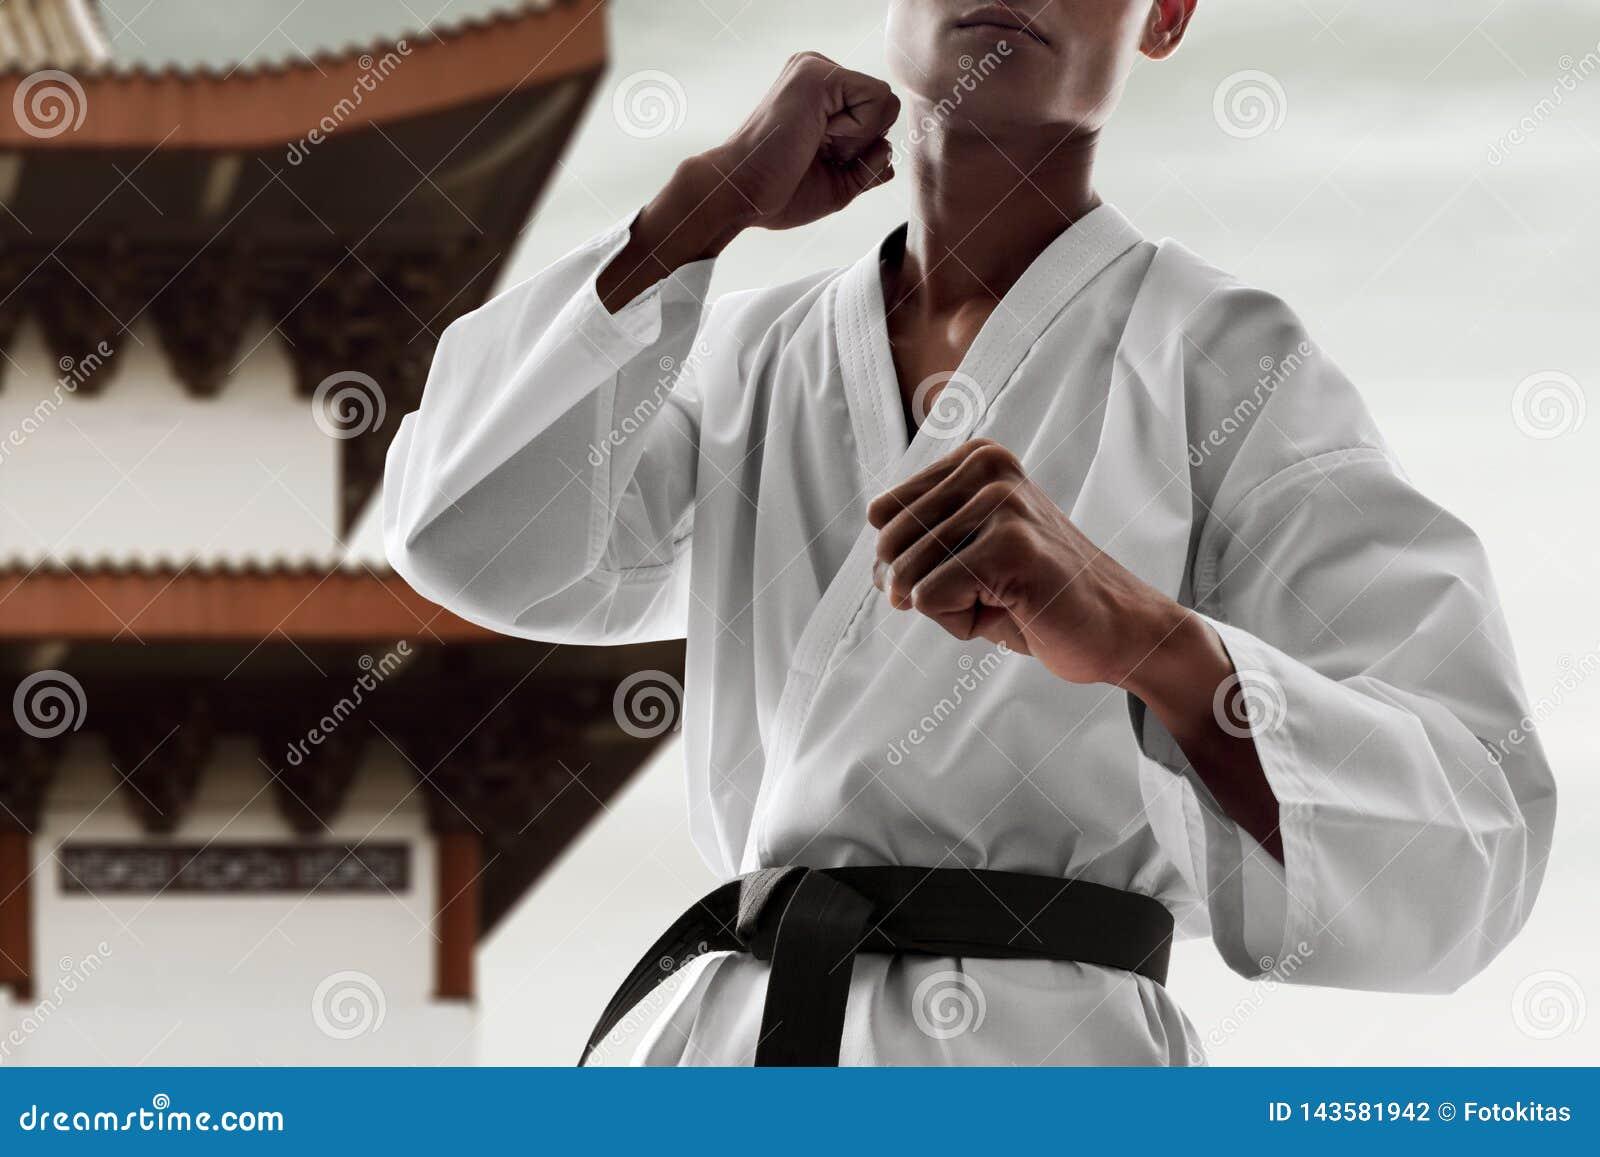 Pose de combat de combattant d art martial